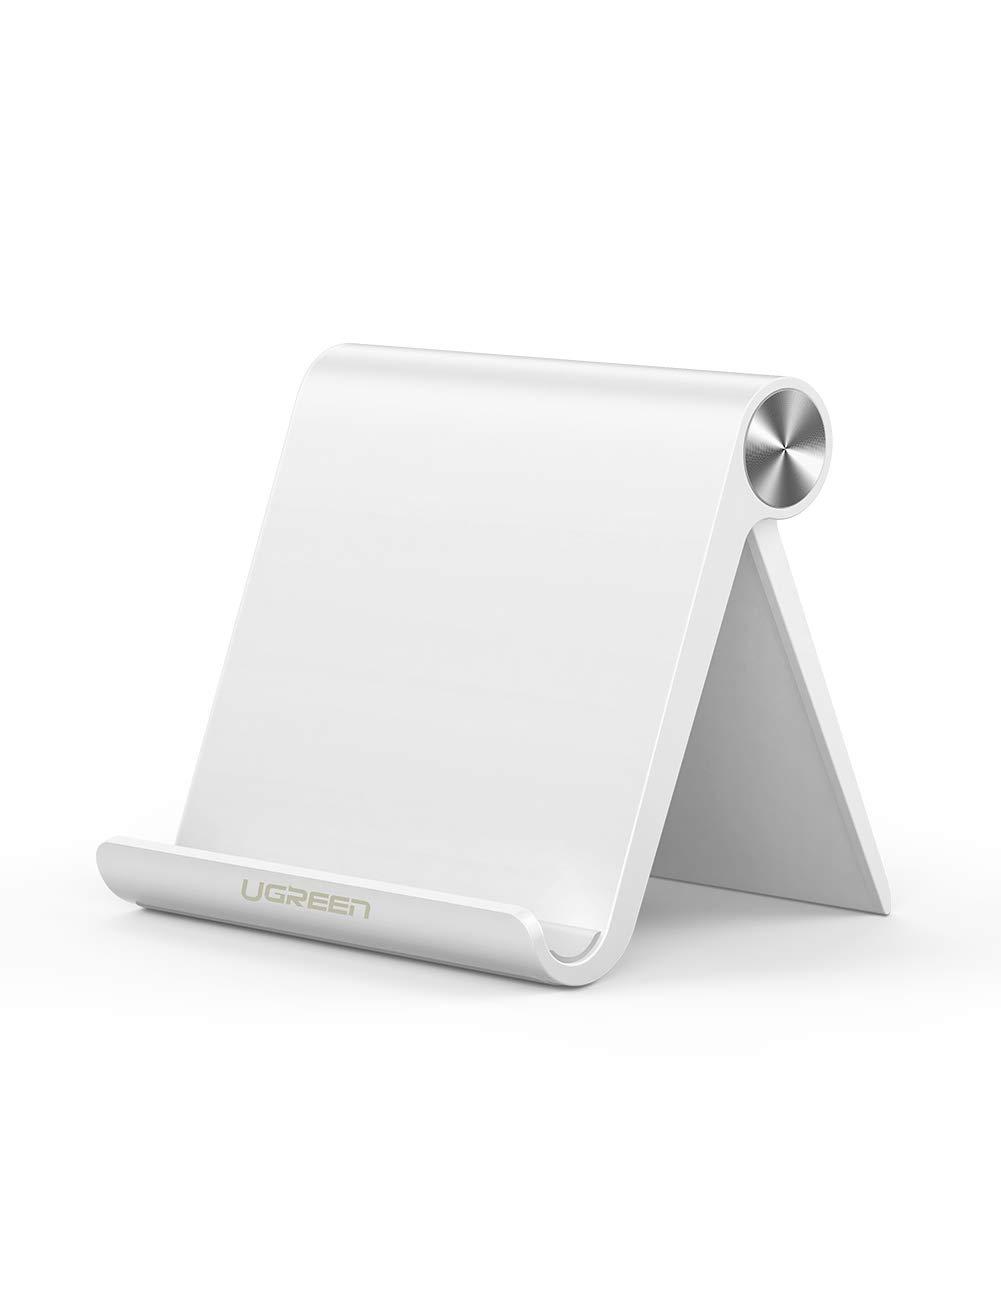 UGREEN Soporte Movil Mesa Multiángulo Soporte Smartphones Universal Ajustable para iPhone XS MAX, XR, 8, Huawei